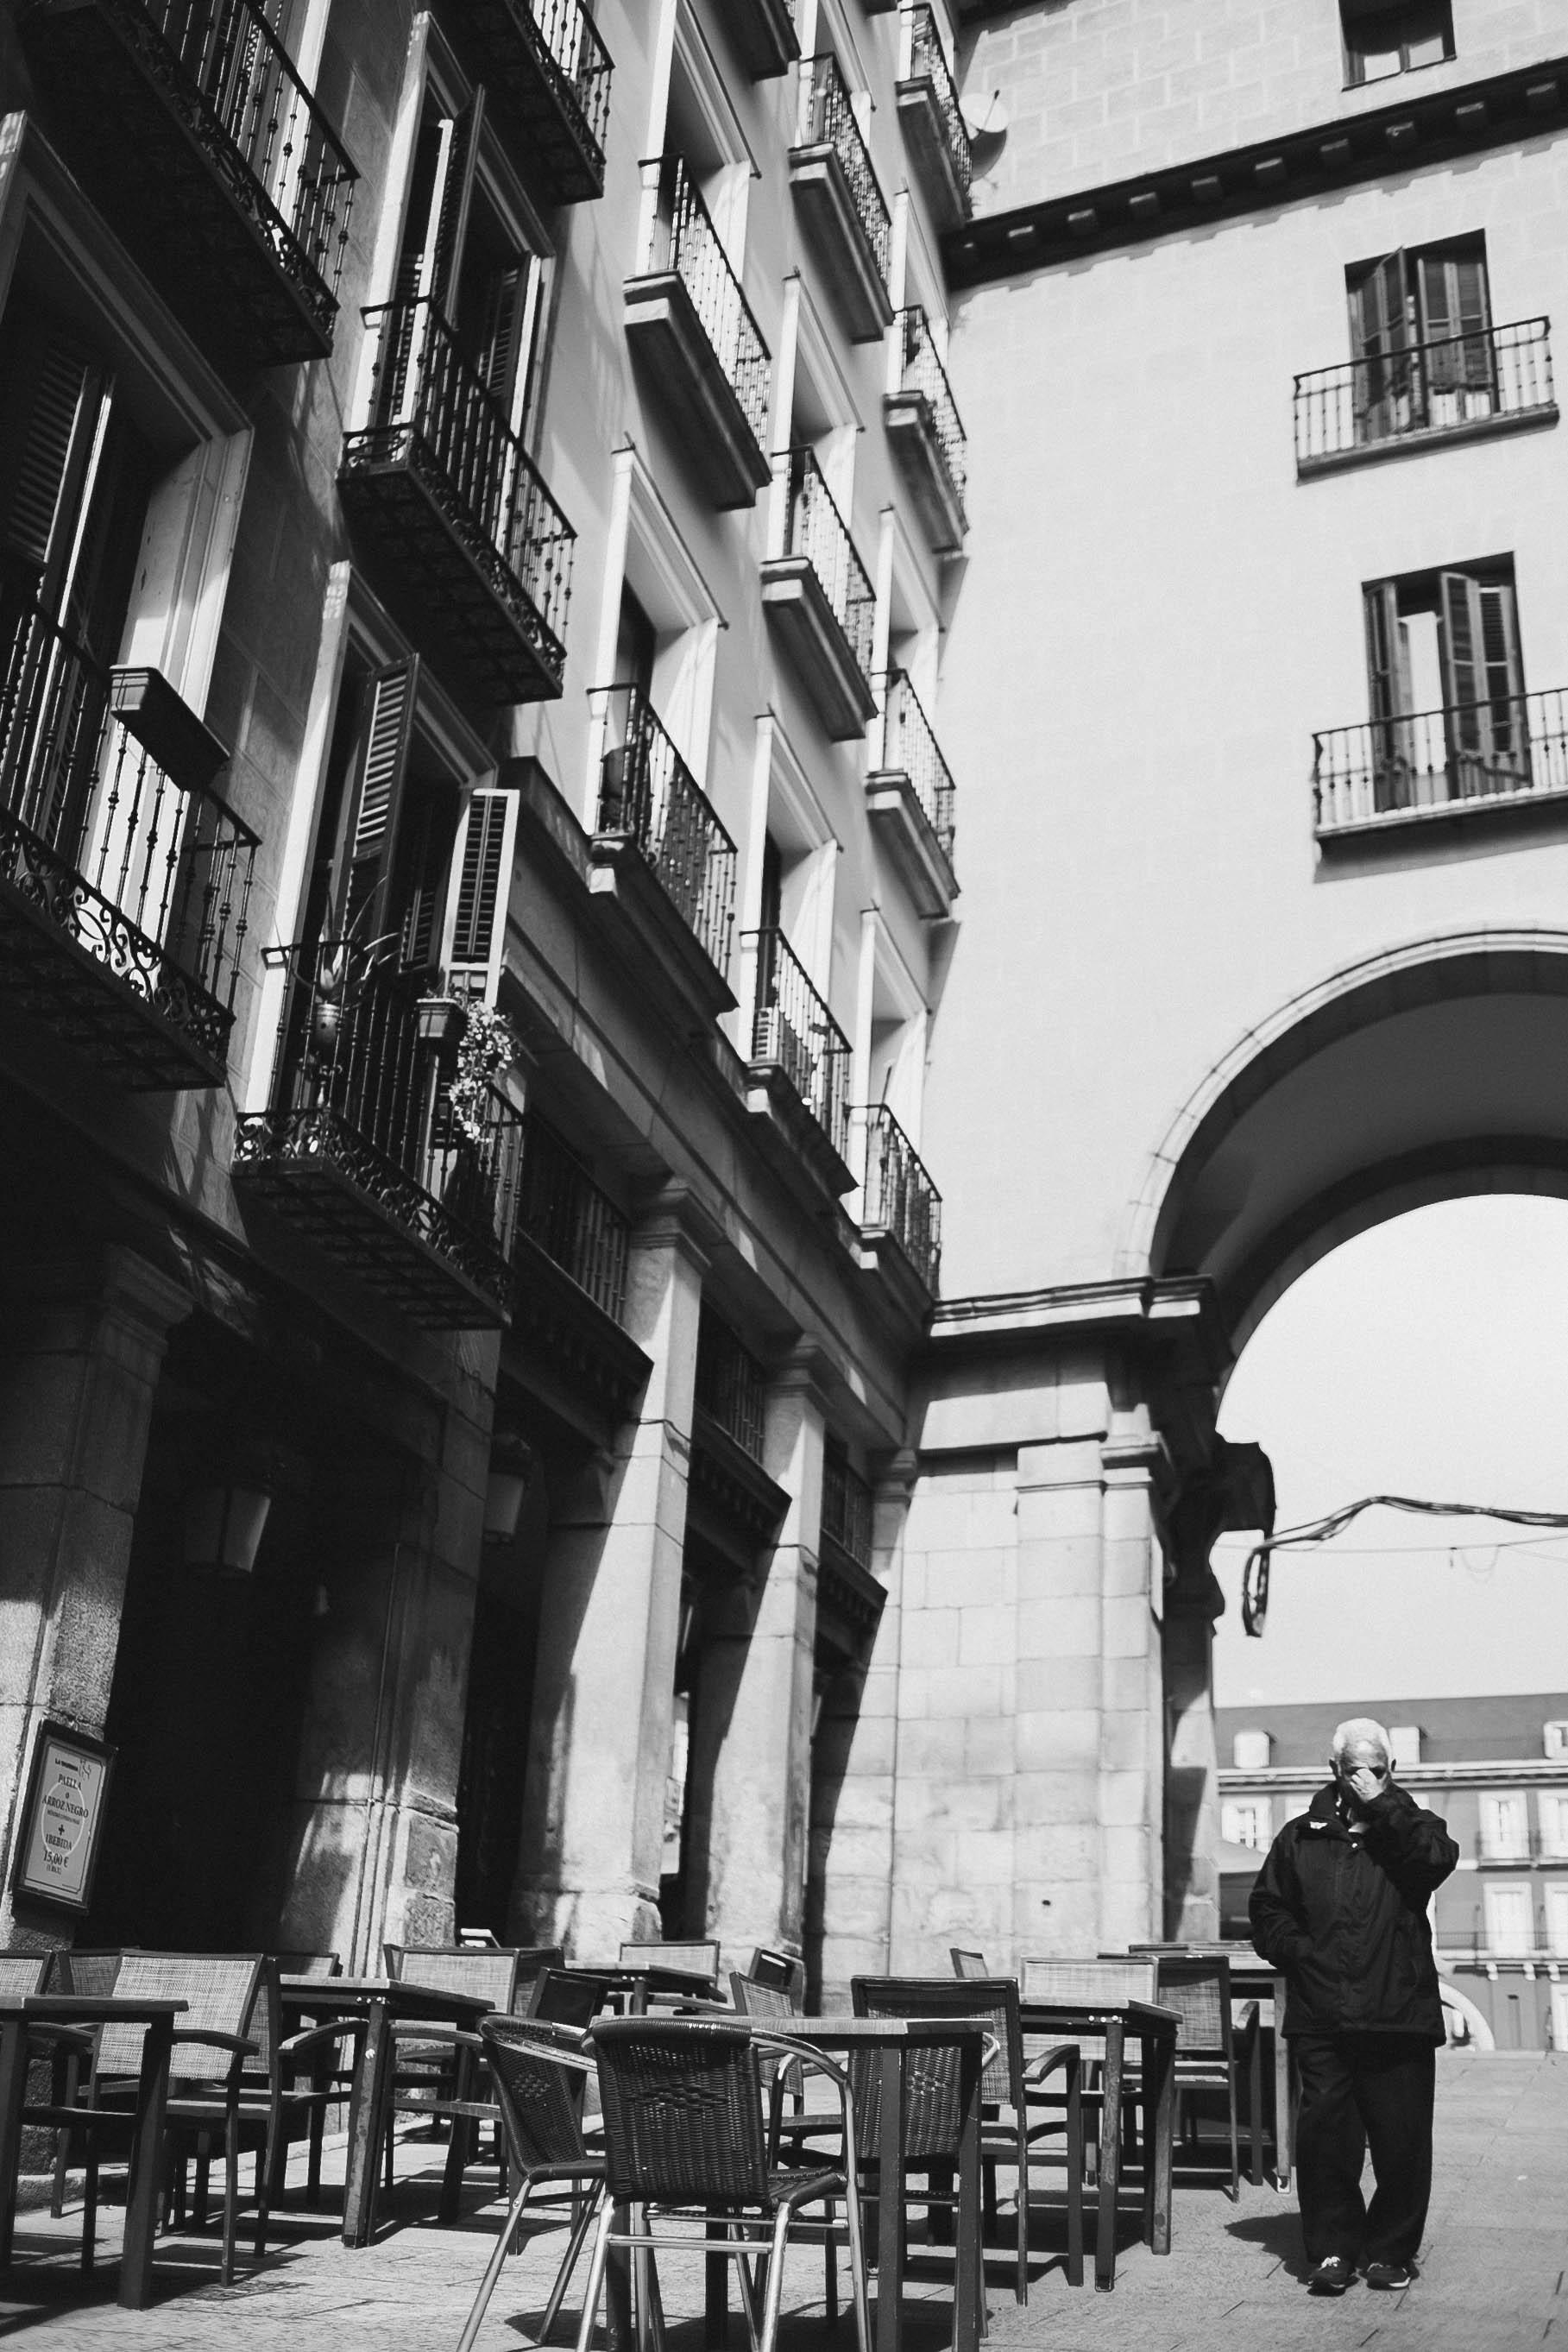 389A7604+-+Madrid.jpg